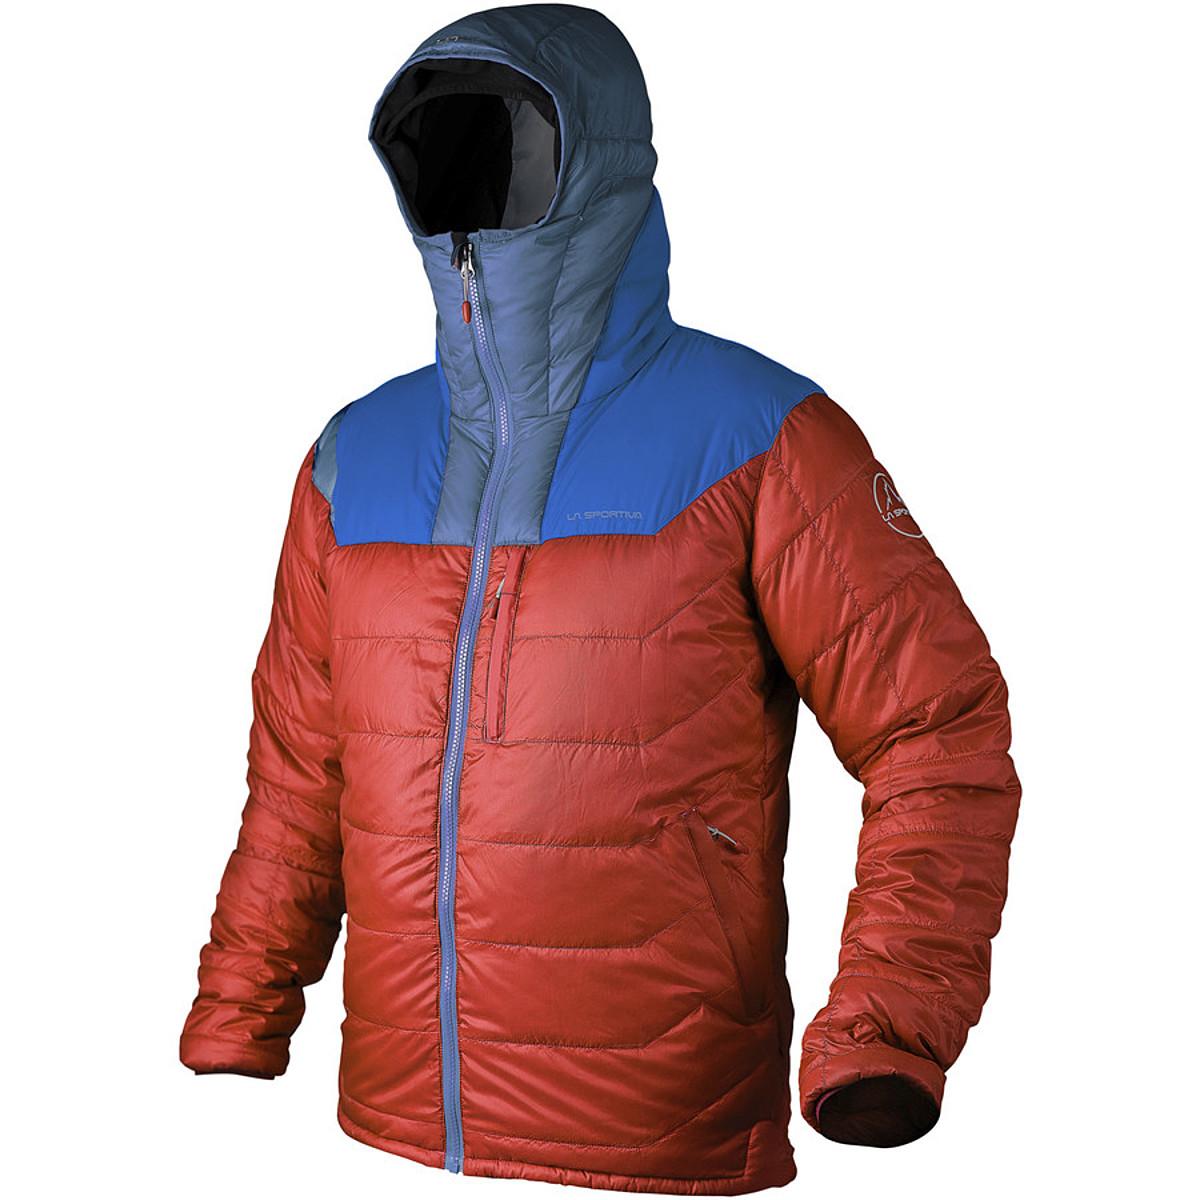 La Sportiva Cham Down Jacket